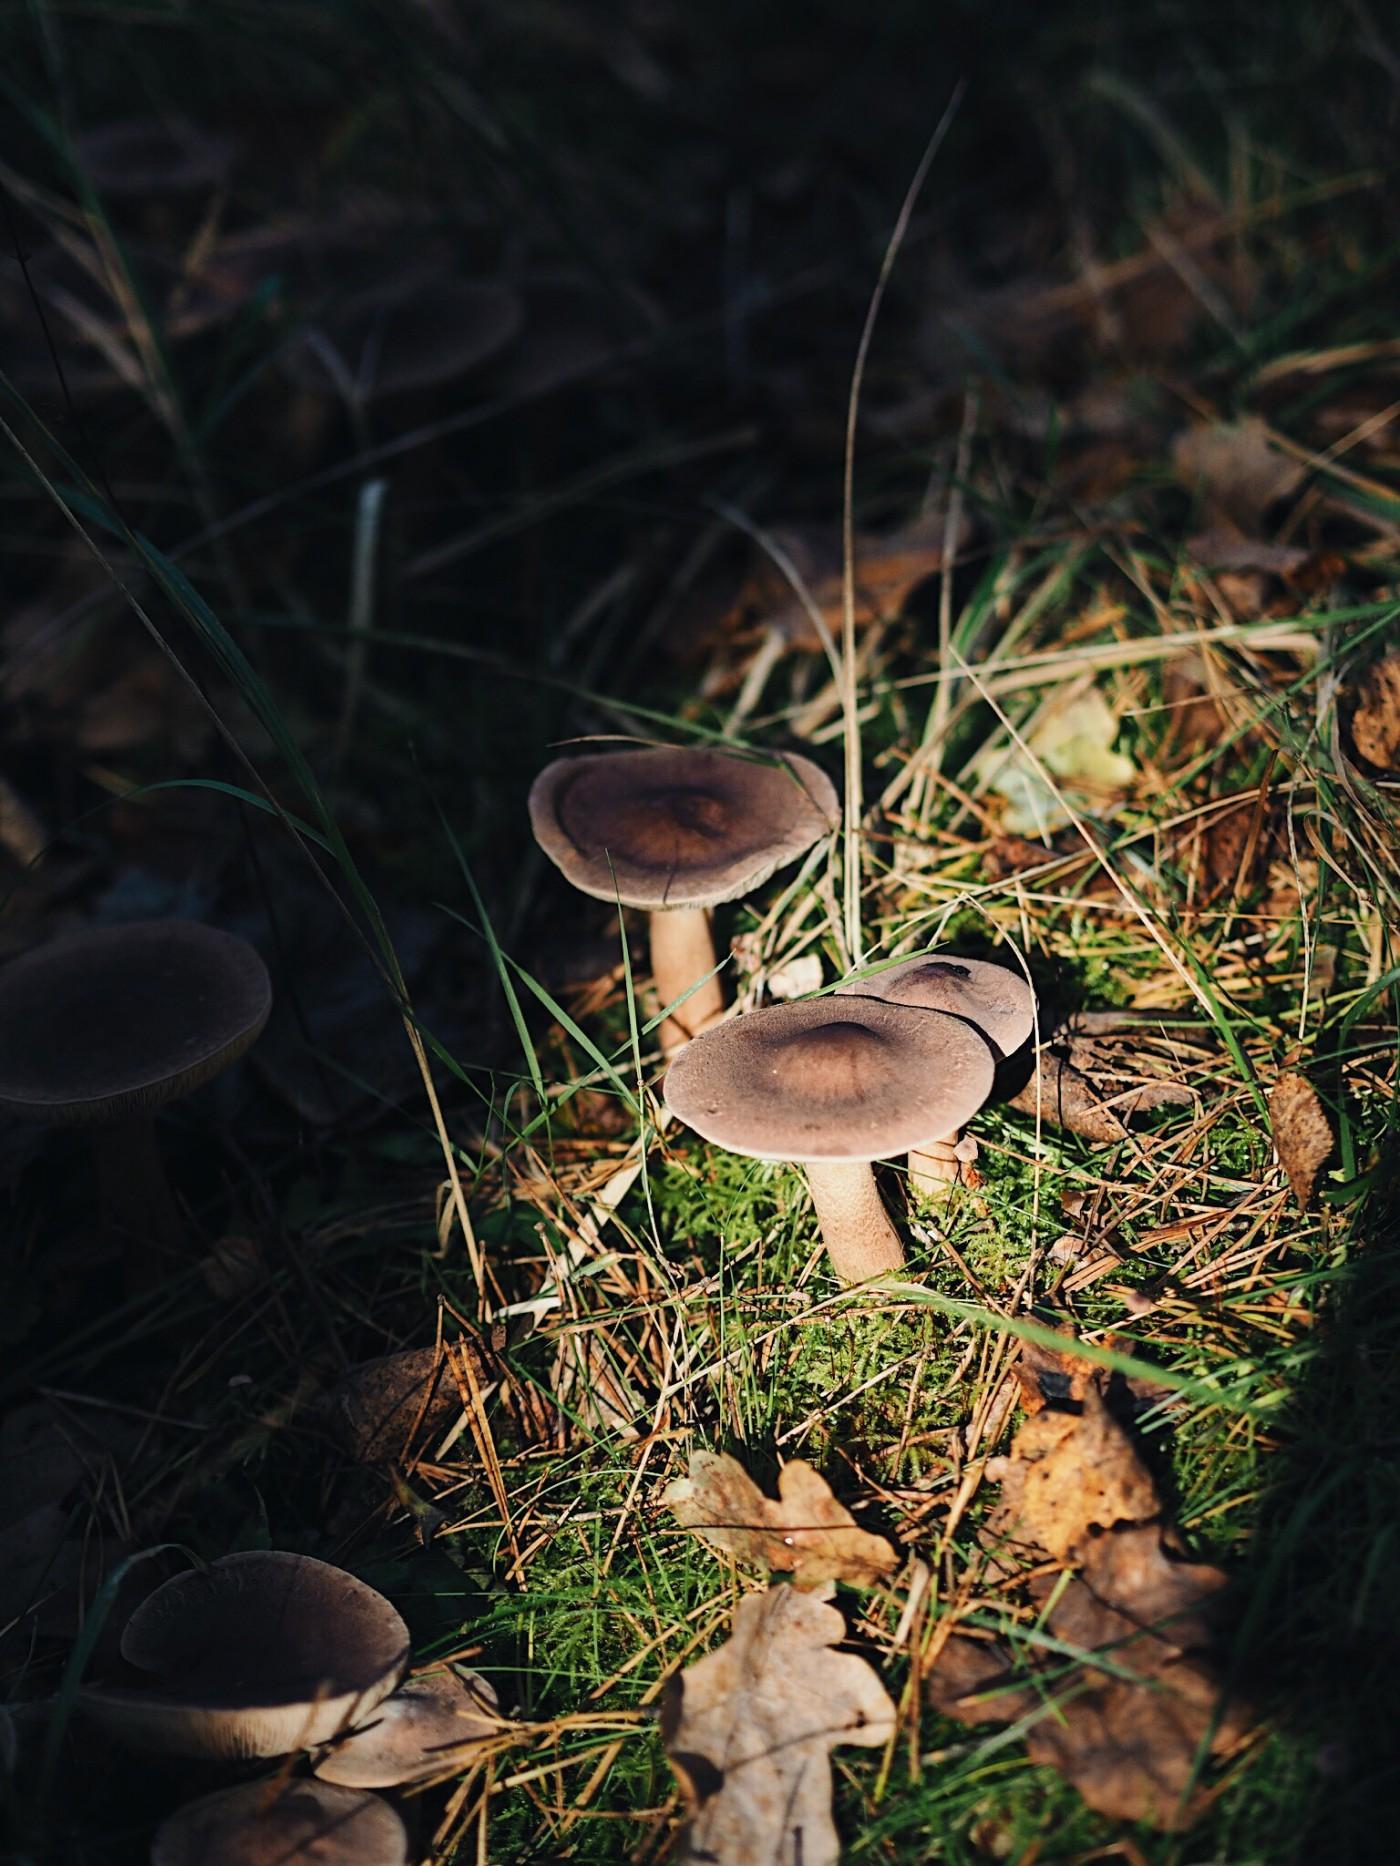 mushroom fairytale folkmagazine evafedeveka photography